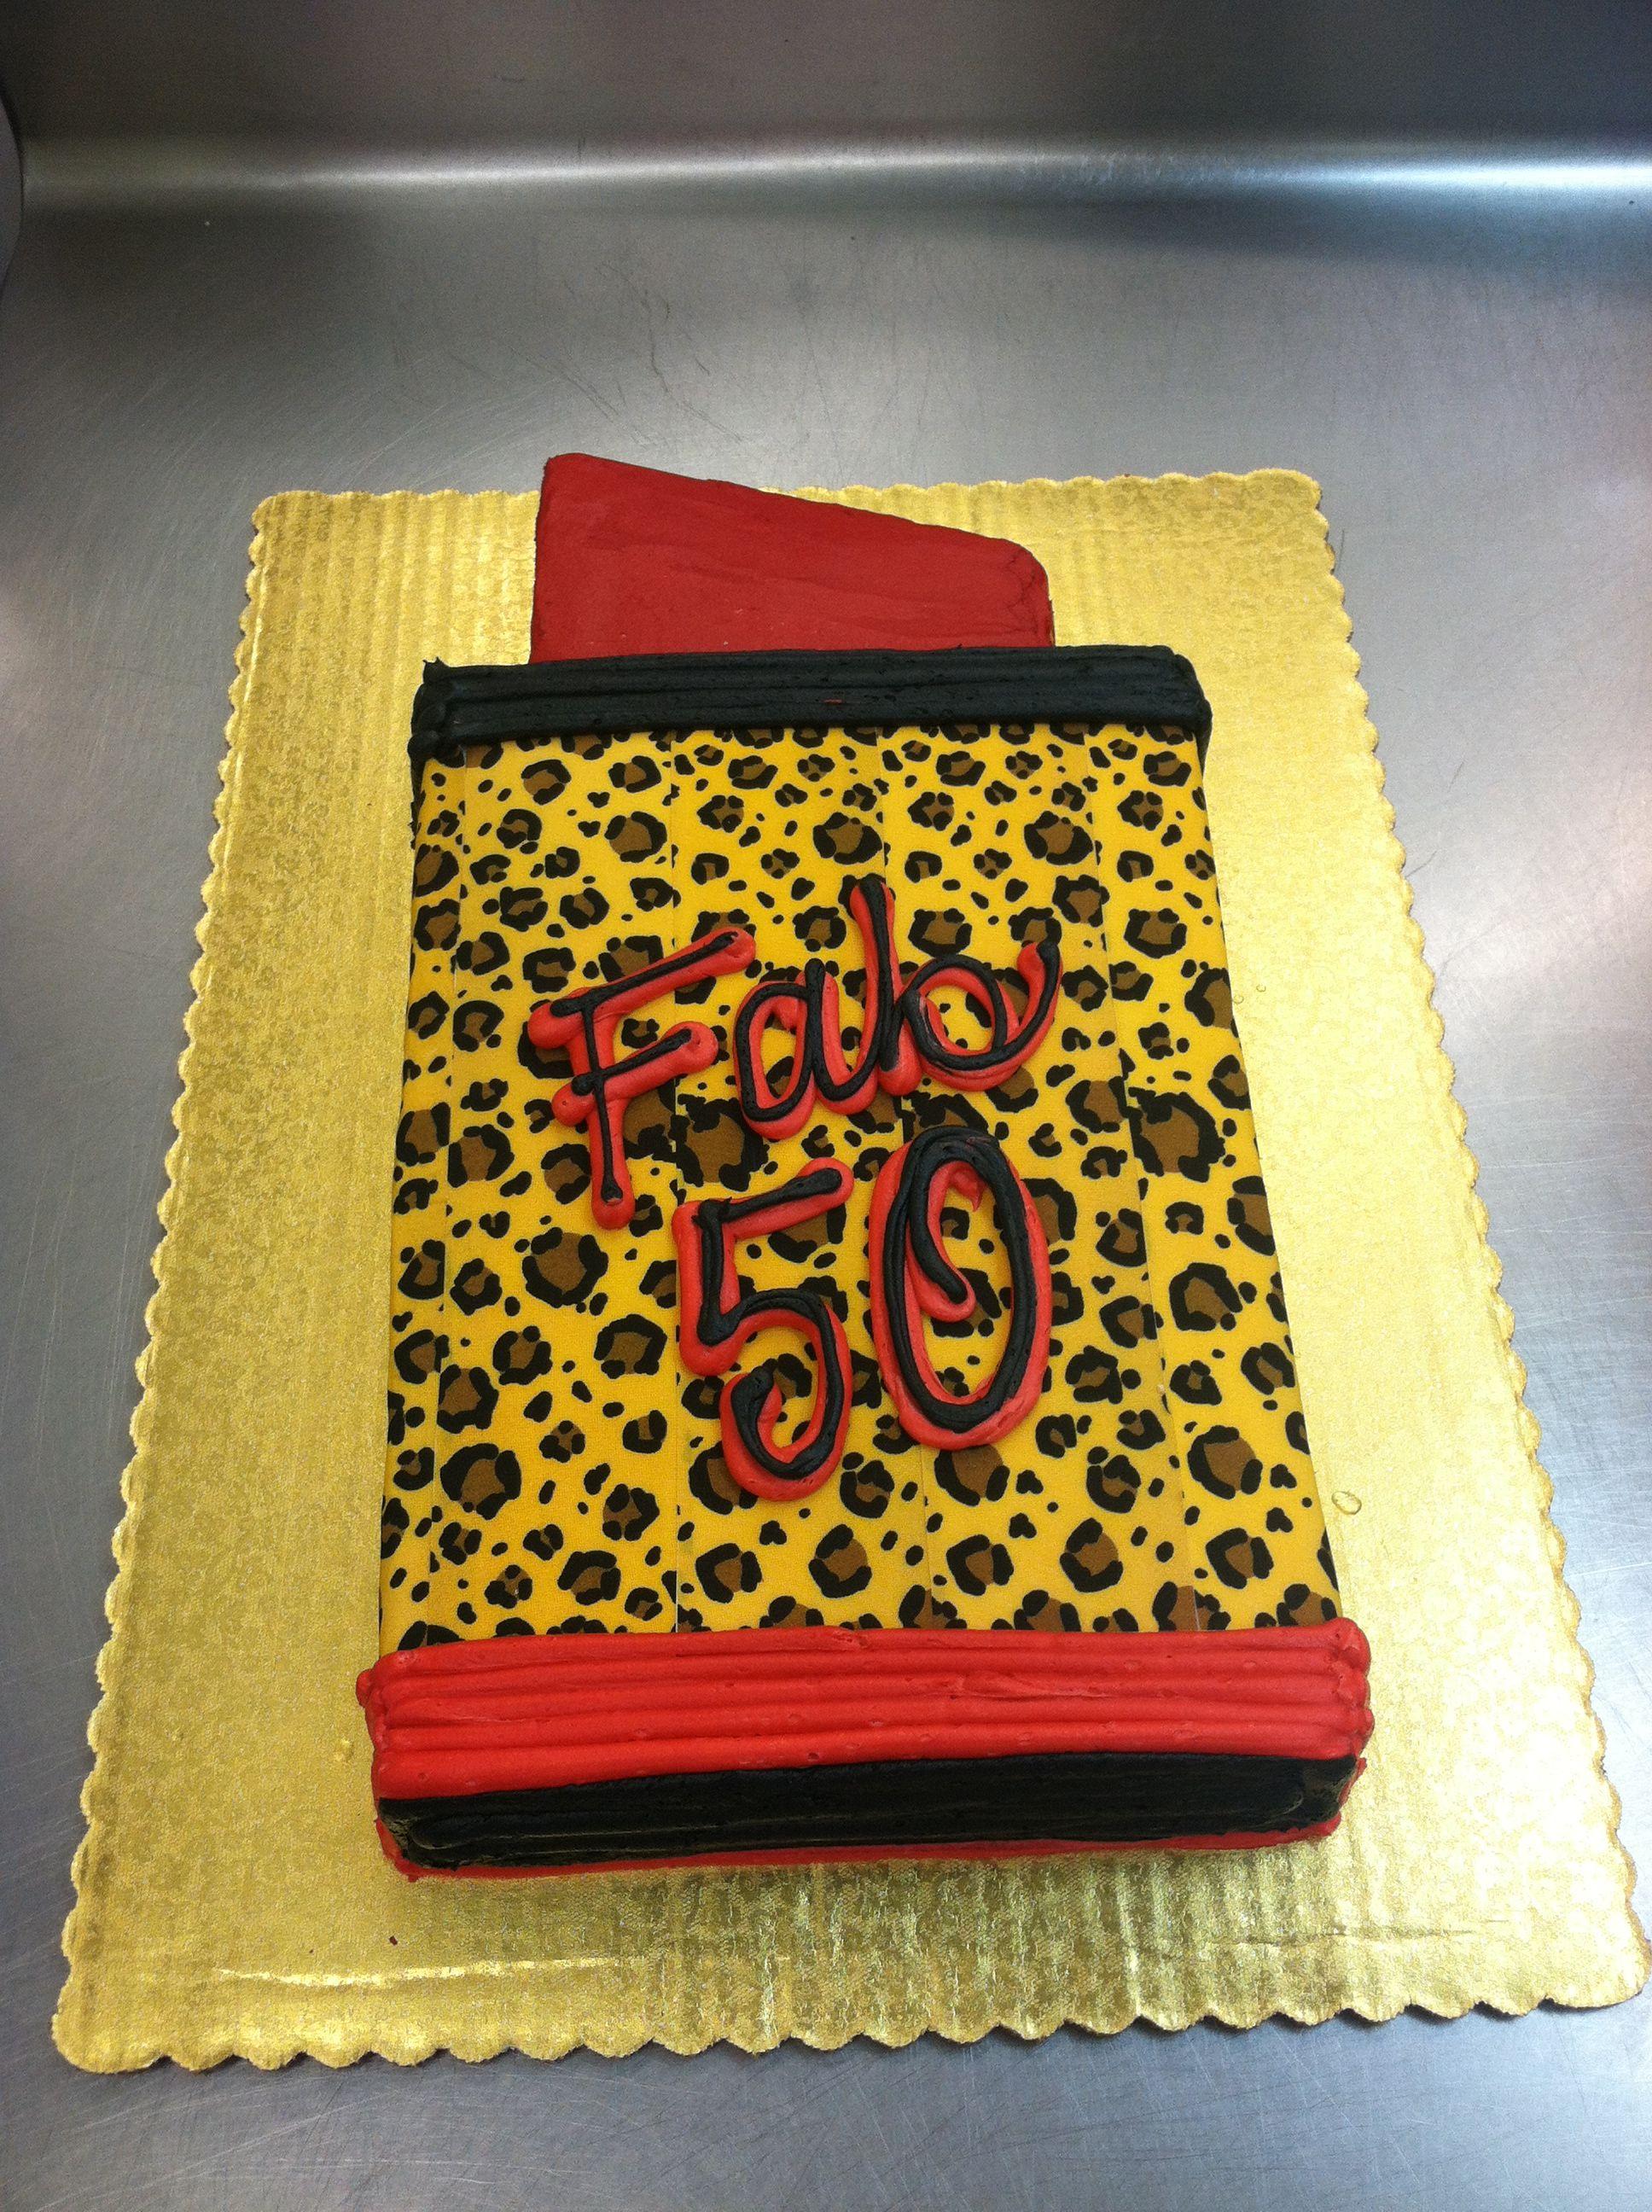 Leopard lipstick birthday cake by stephanie dillon ls1 hy